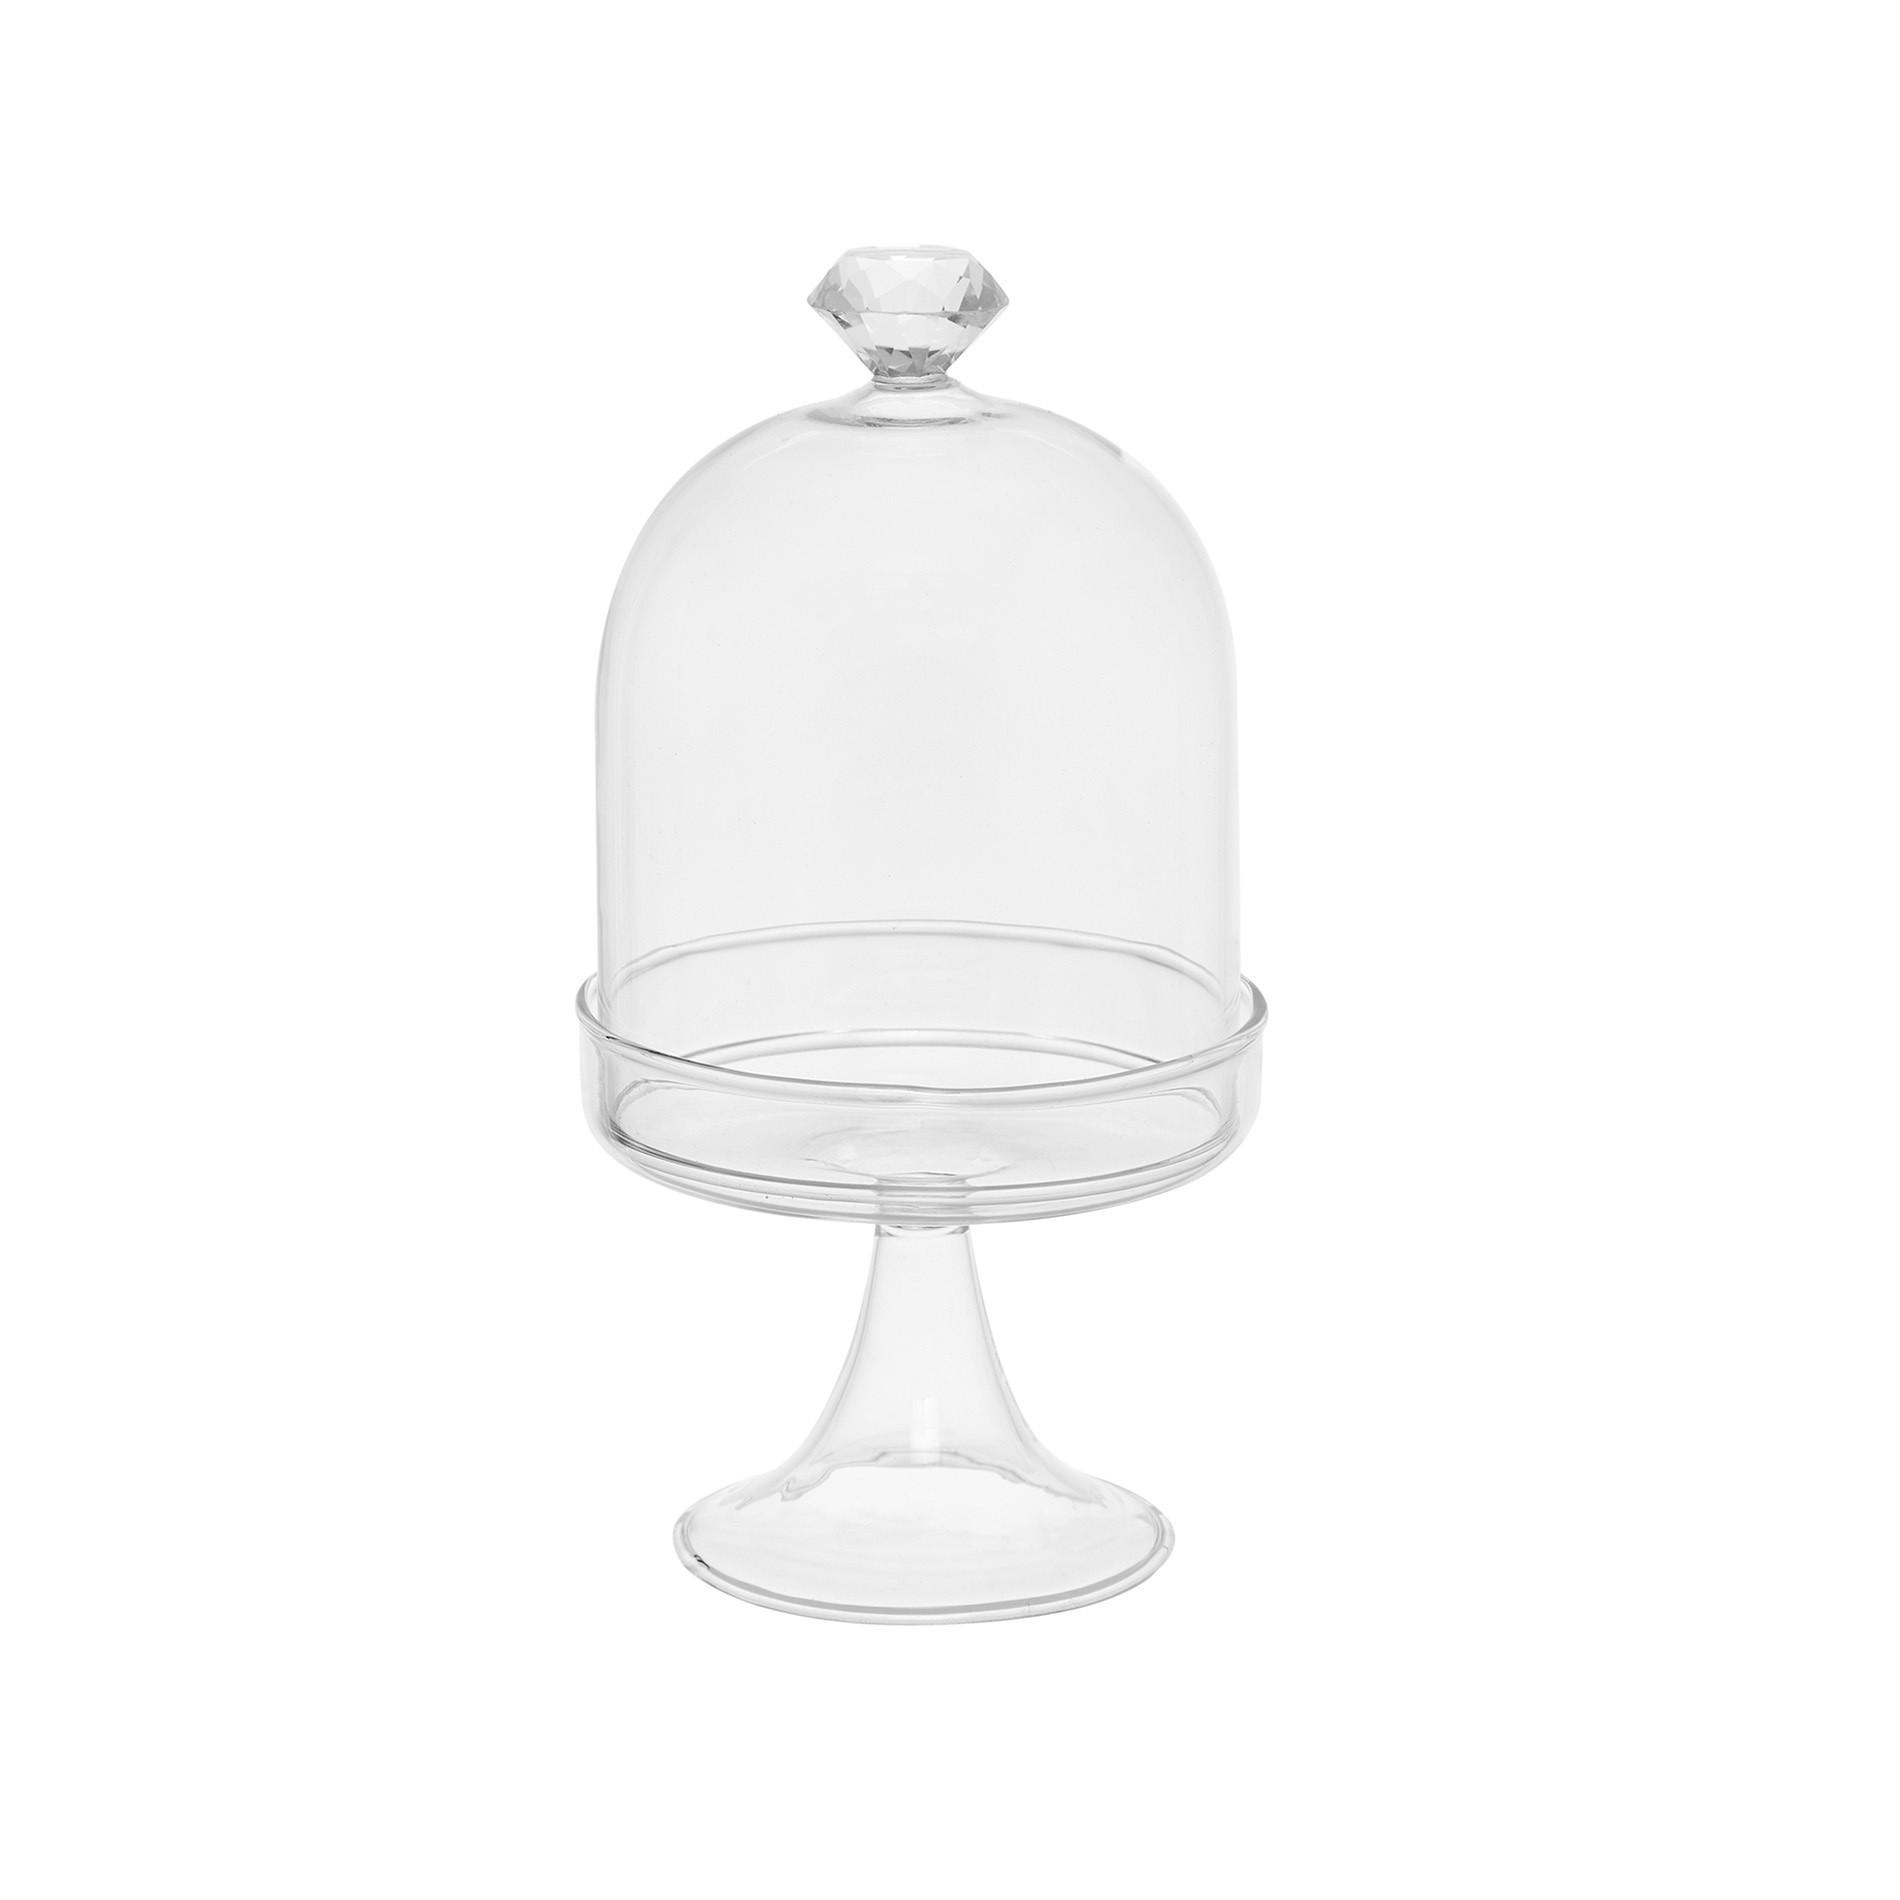 Alzata vetro con diamante, Bianco, large image number 0